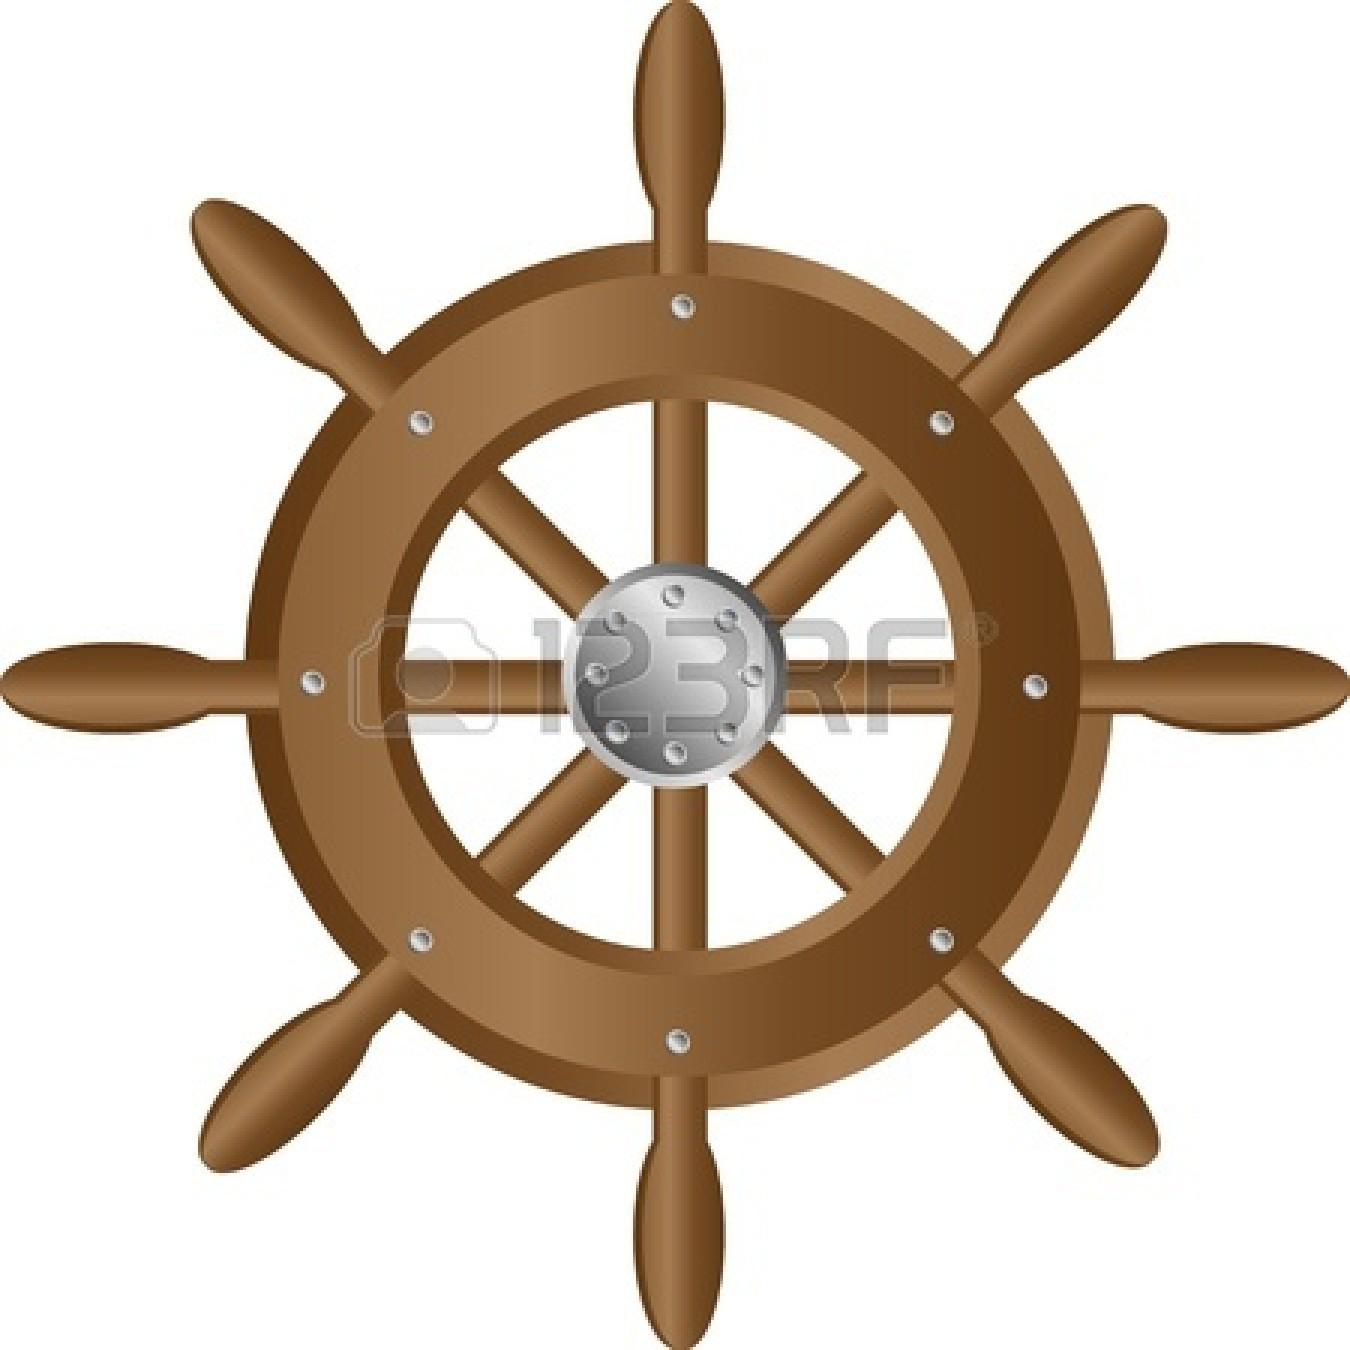 Sailboat clipart ship steering wheel Free steering%20wheel%20clipart Clipart Images Clipart